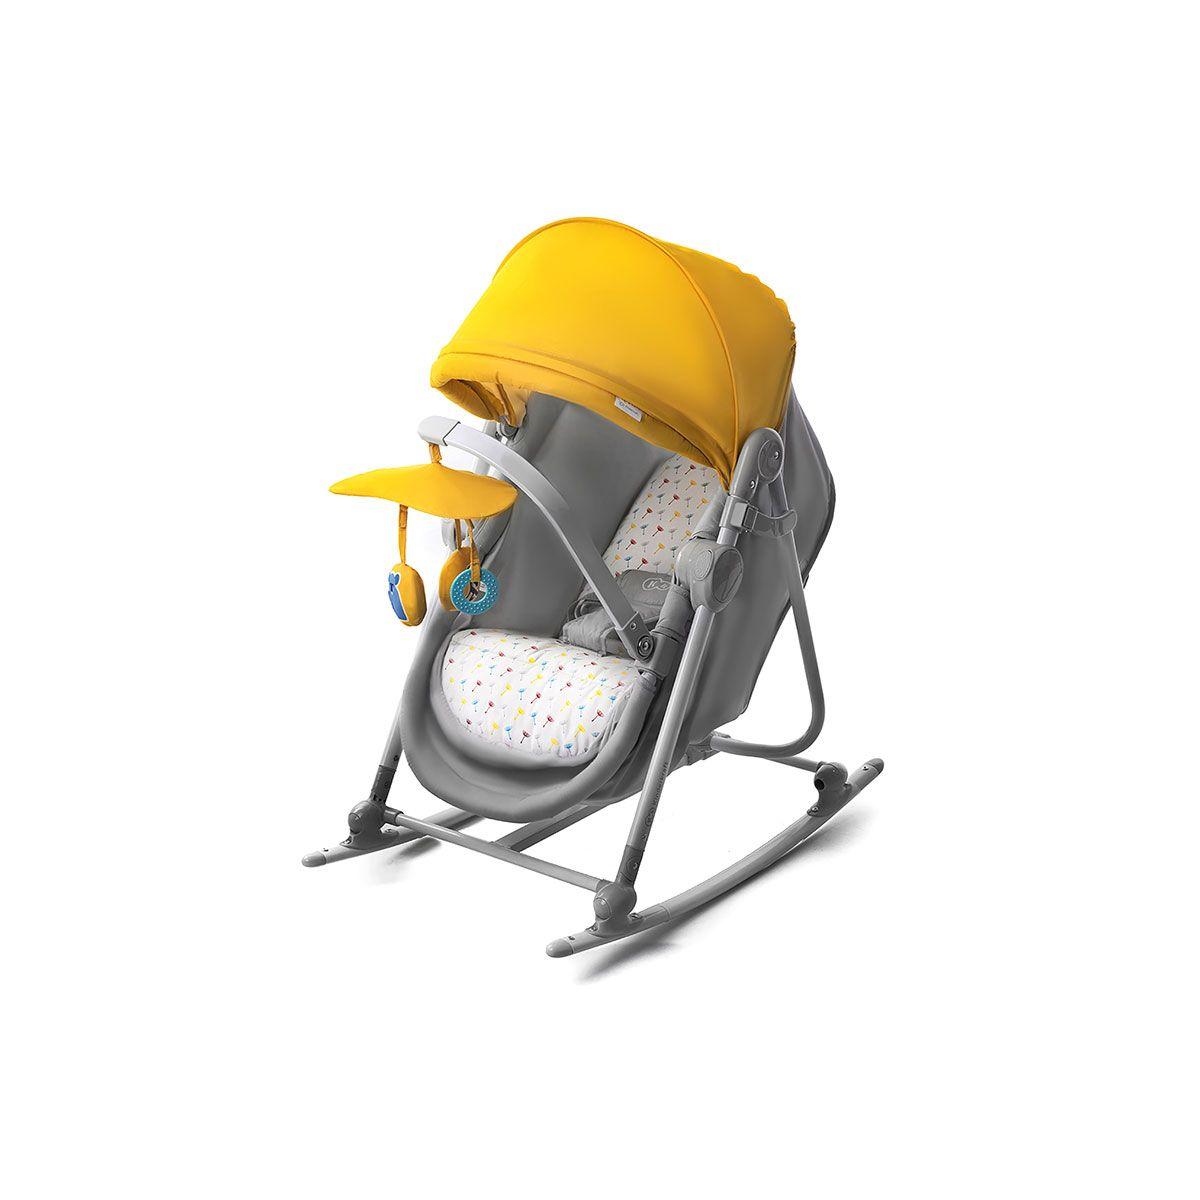 Kinderkraft unimo transat de b b balan oire pour bascule for Chaise kinderkraft